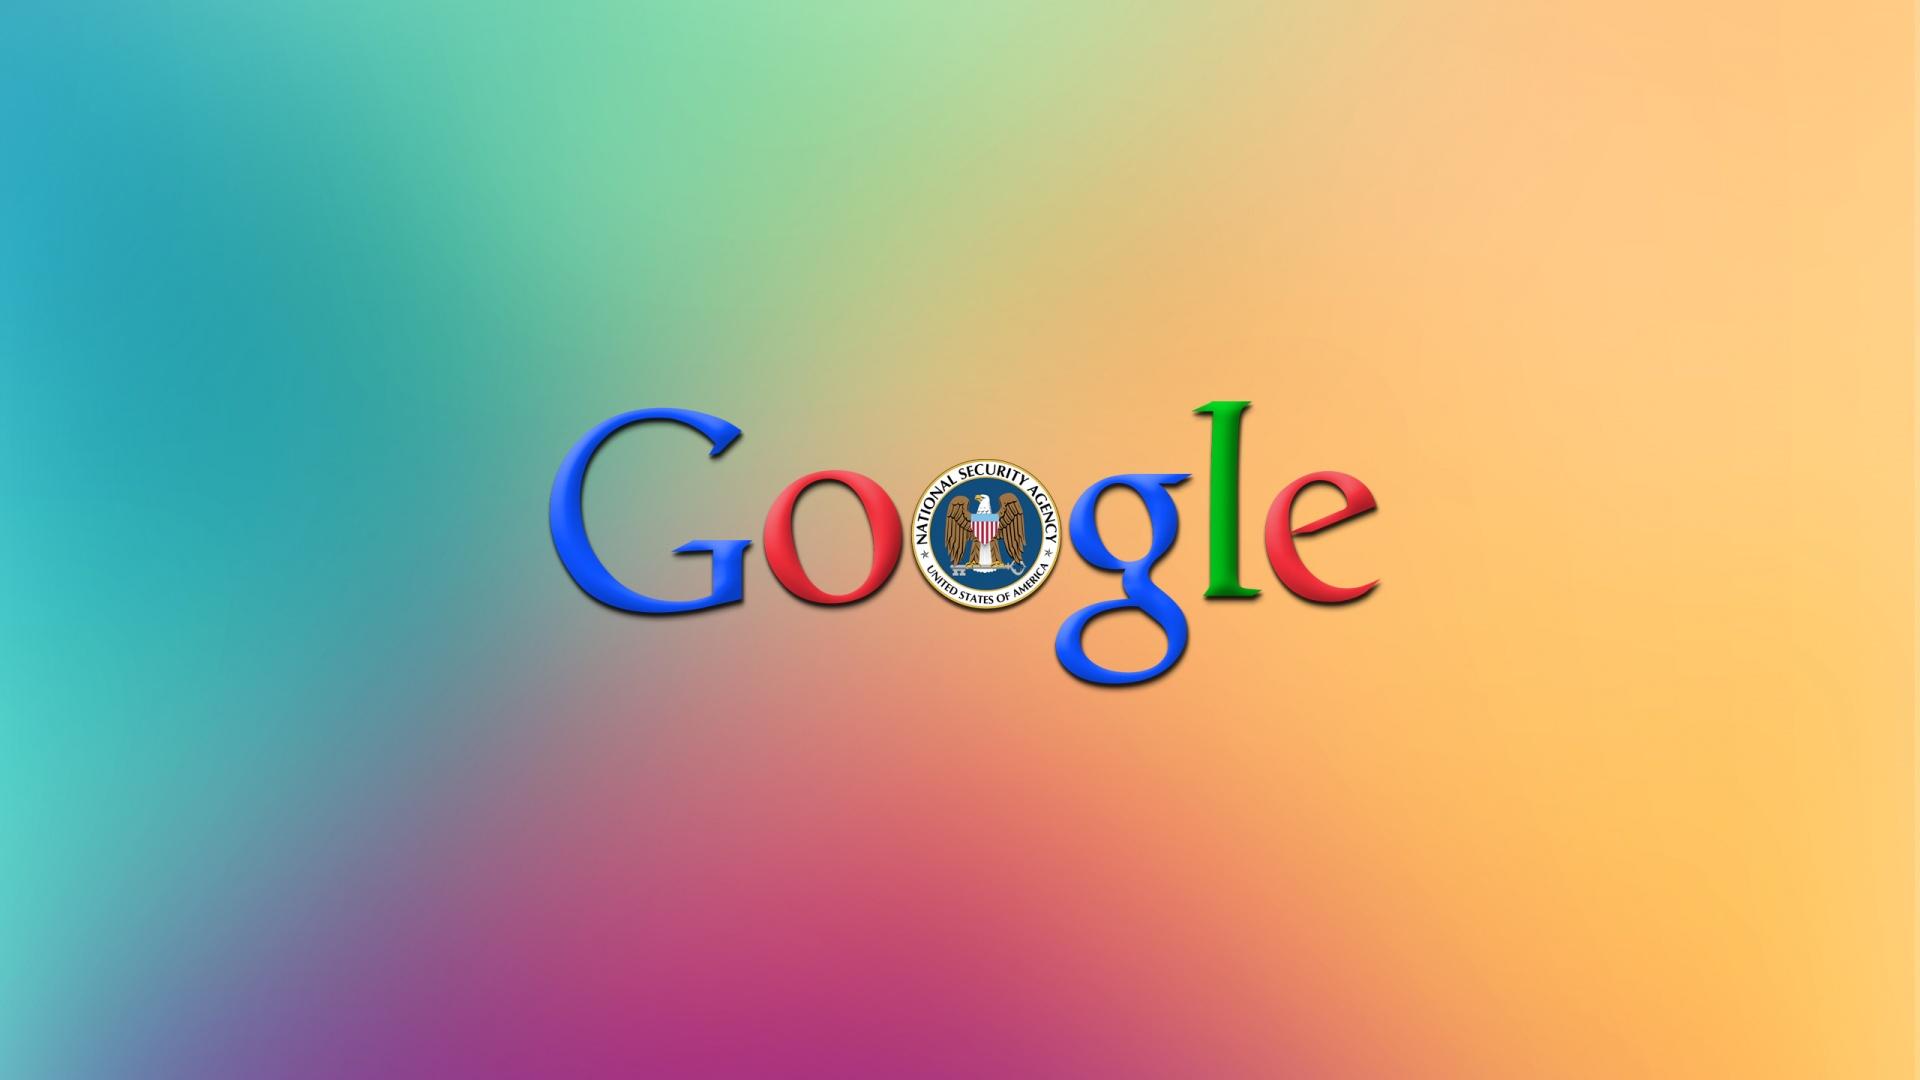 Google Background Image - WallpaperSafari